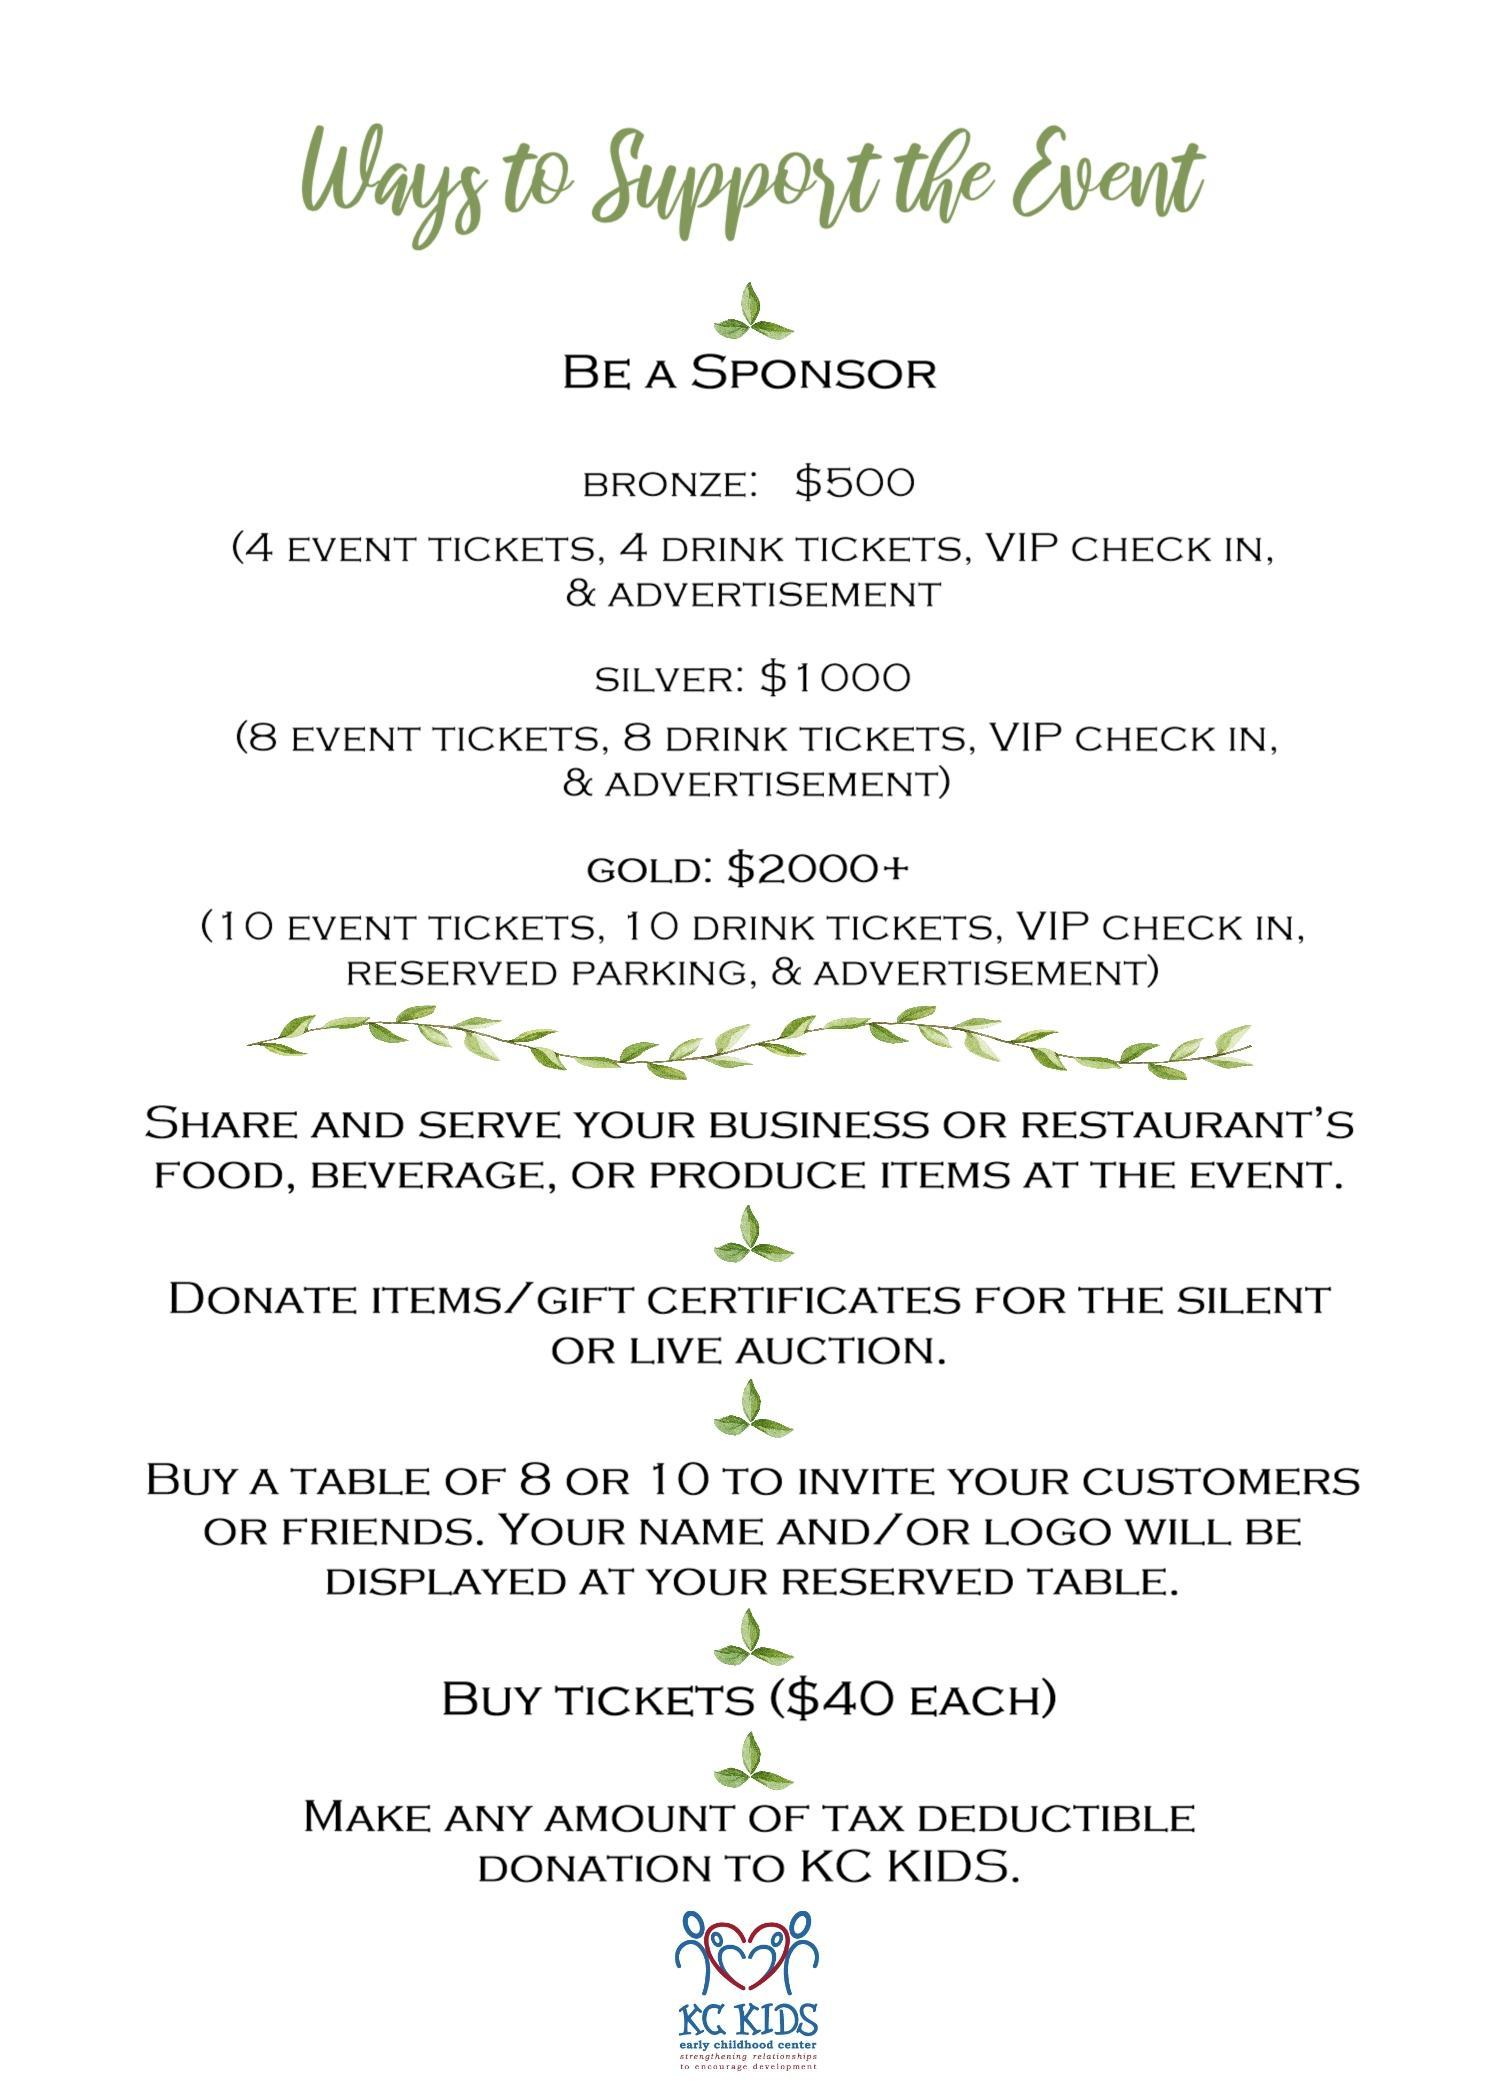 TOV Ticket and Sponsor Info